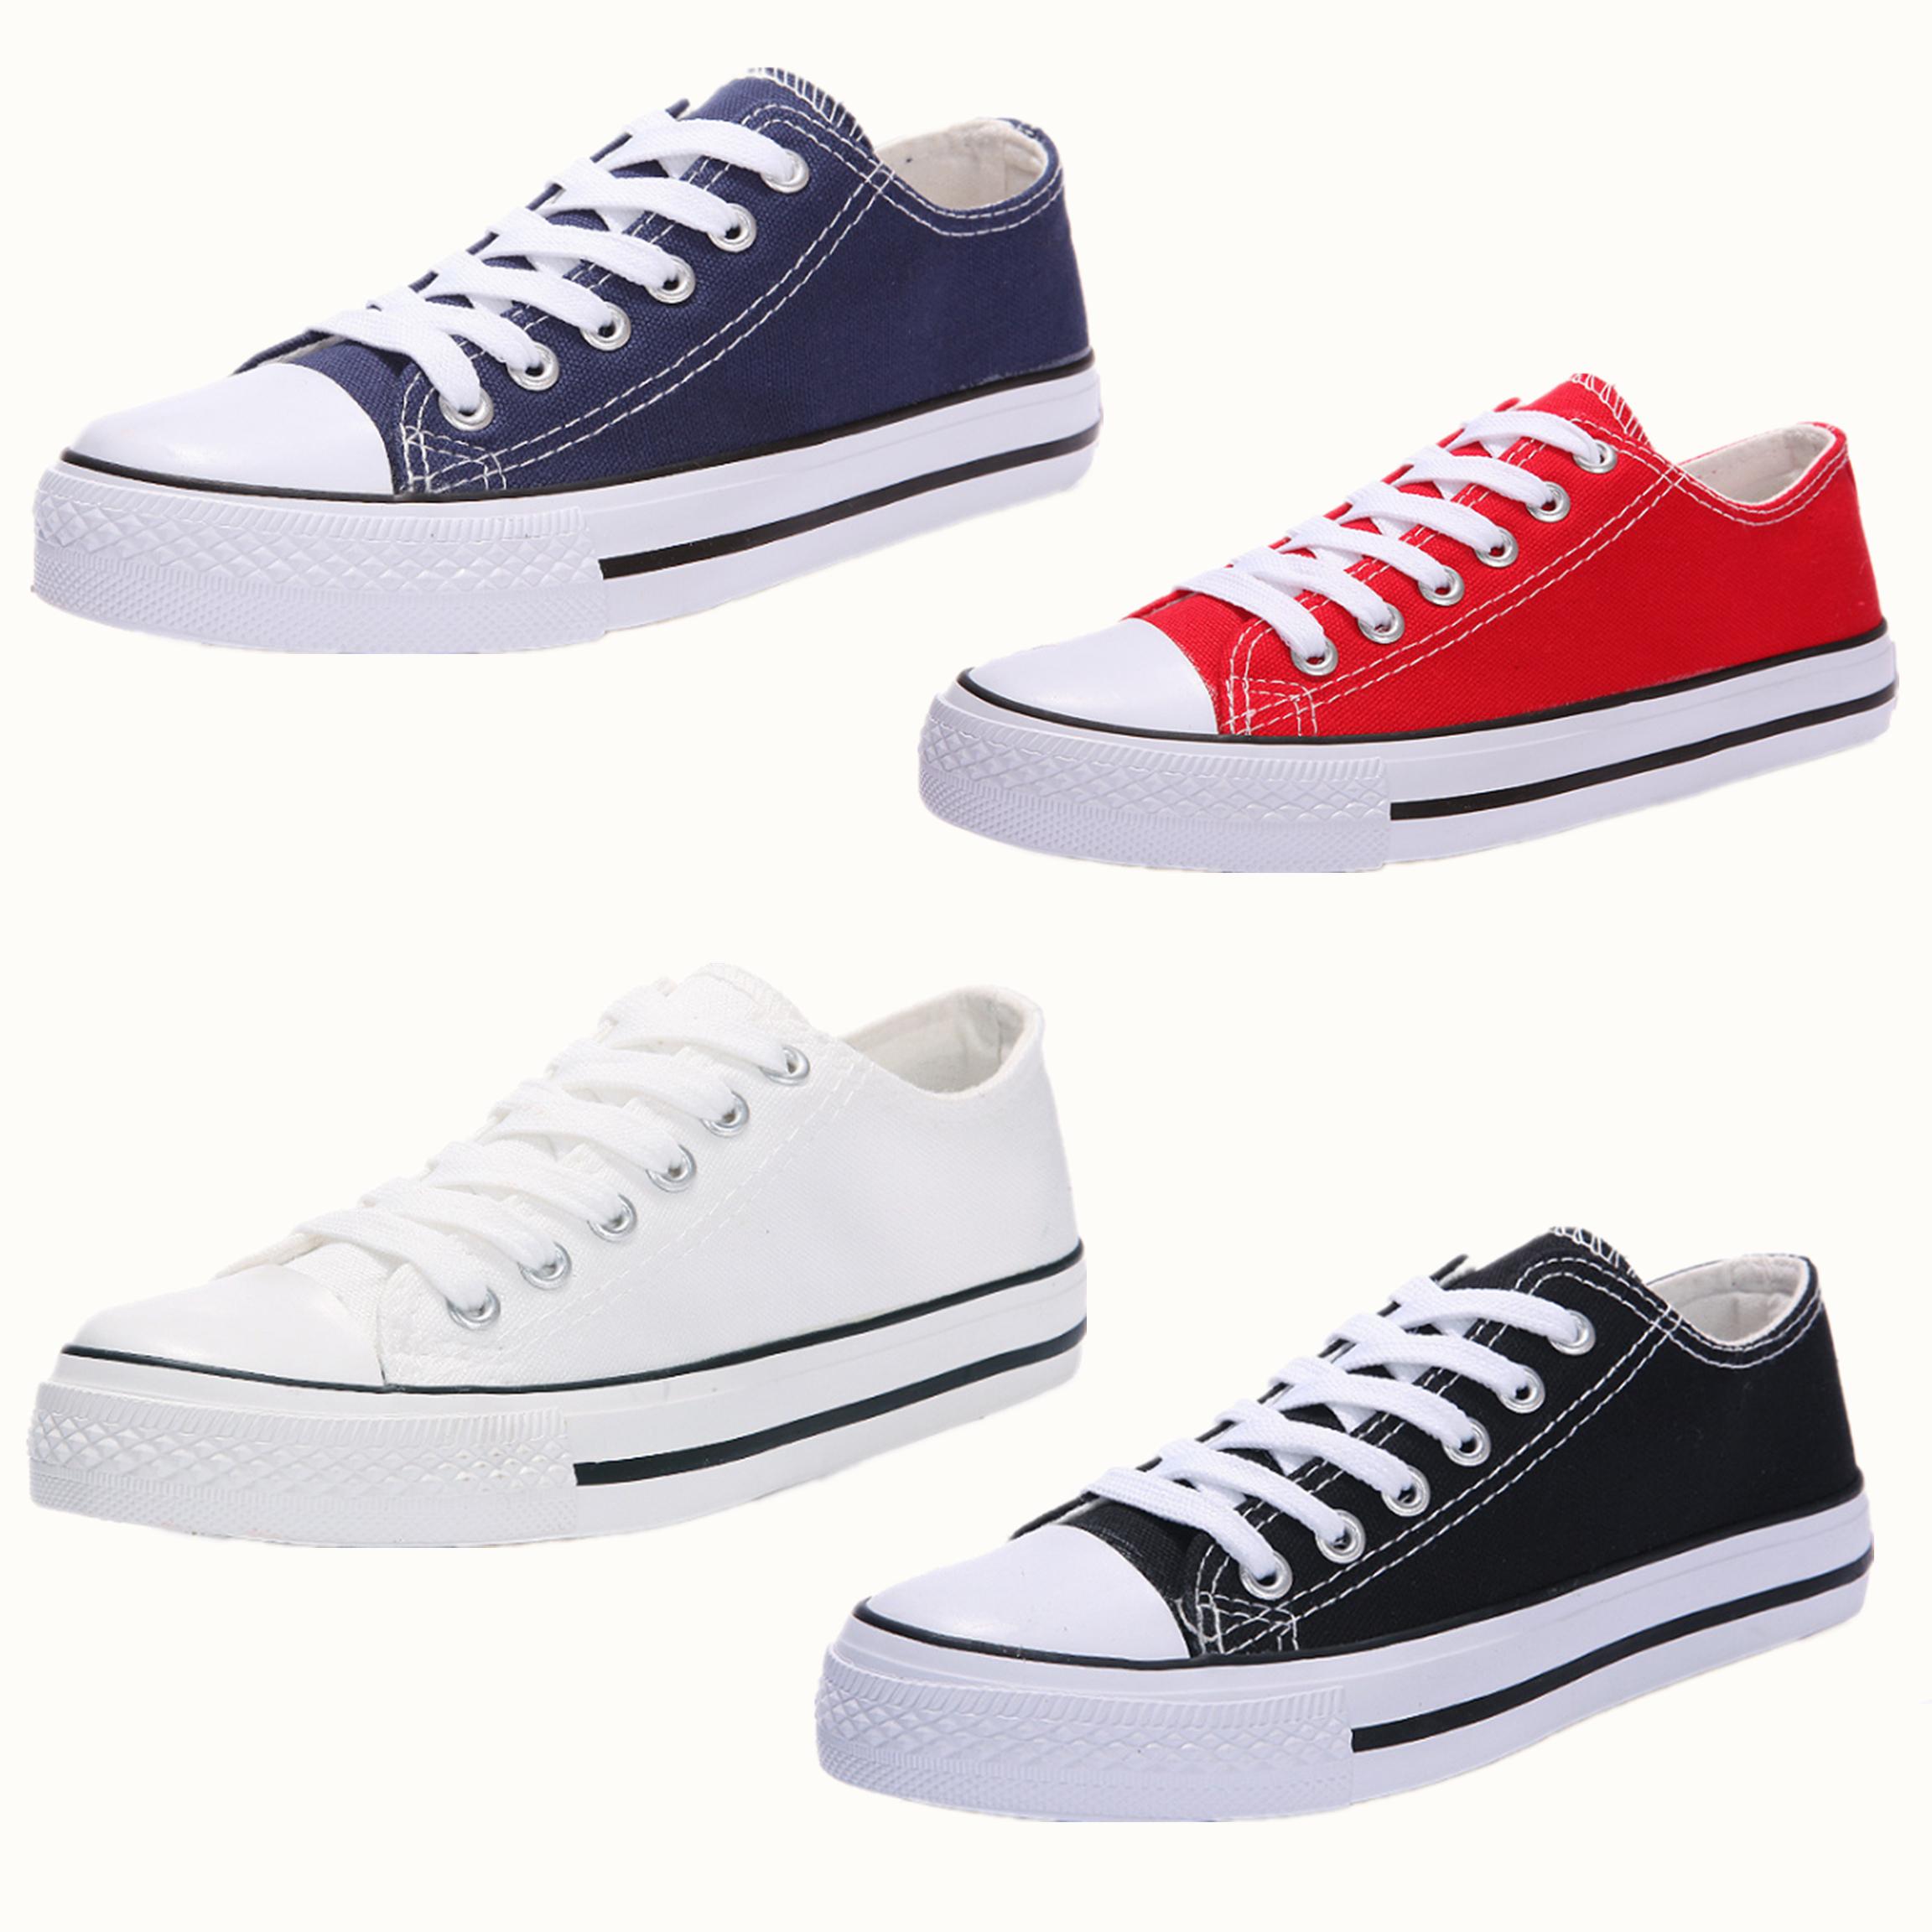 China women's shoes flats wholesale ???????? Alibaba